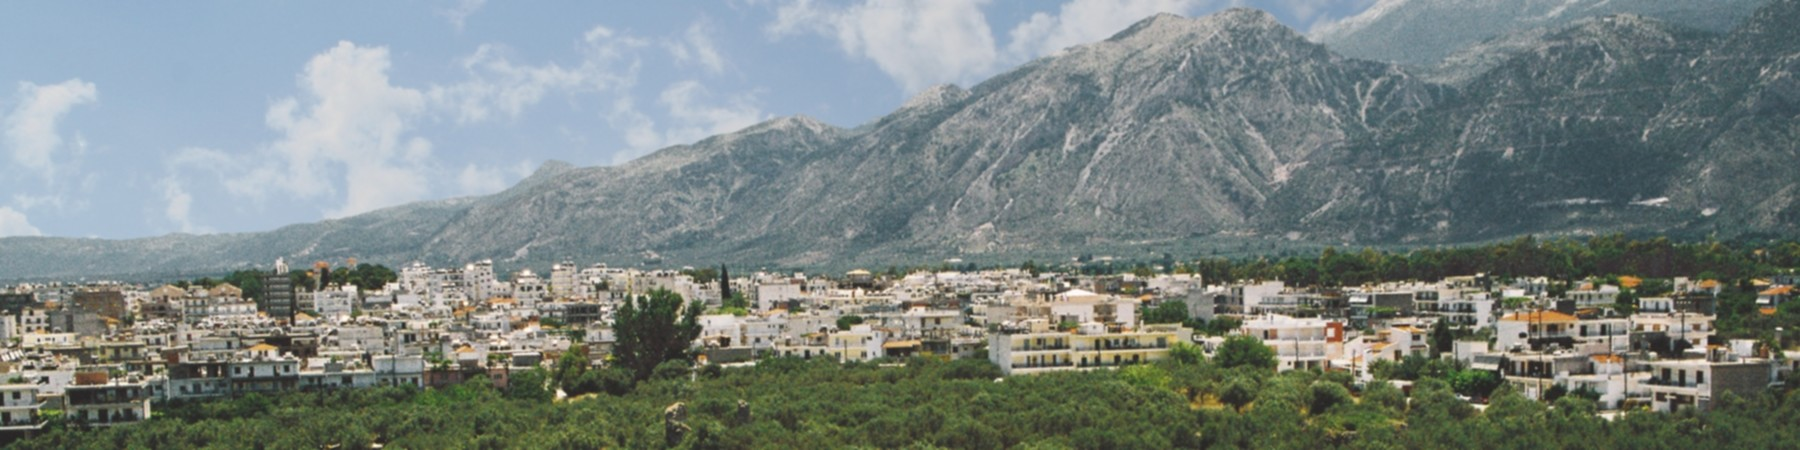 Where Eat Athens Greece